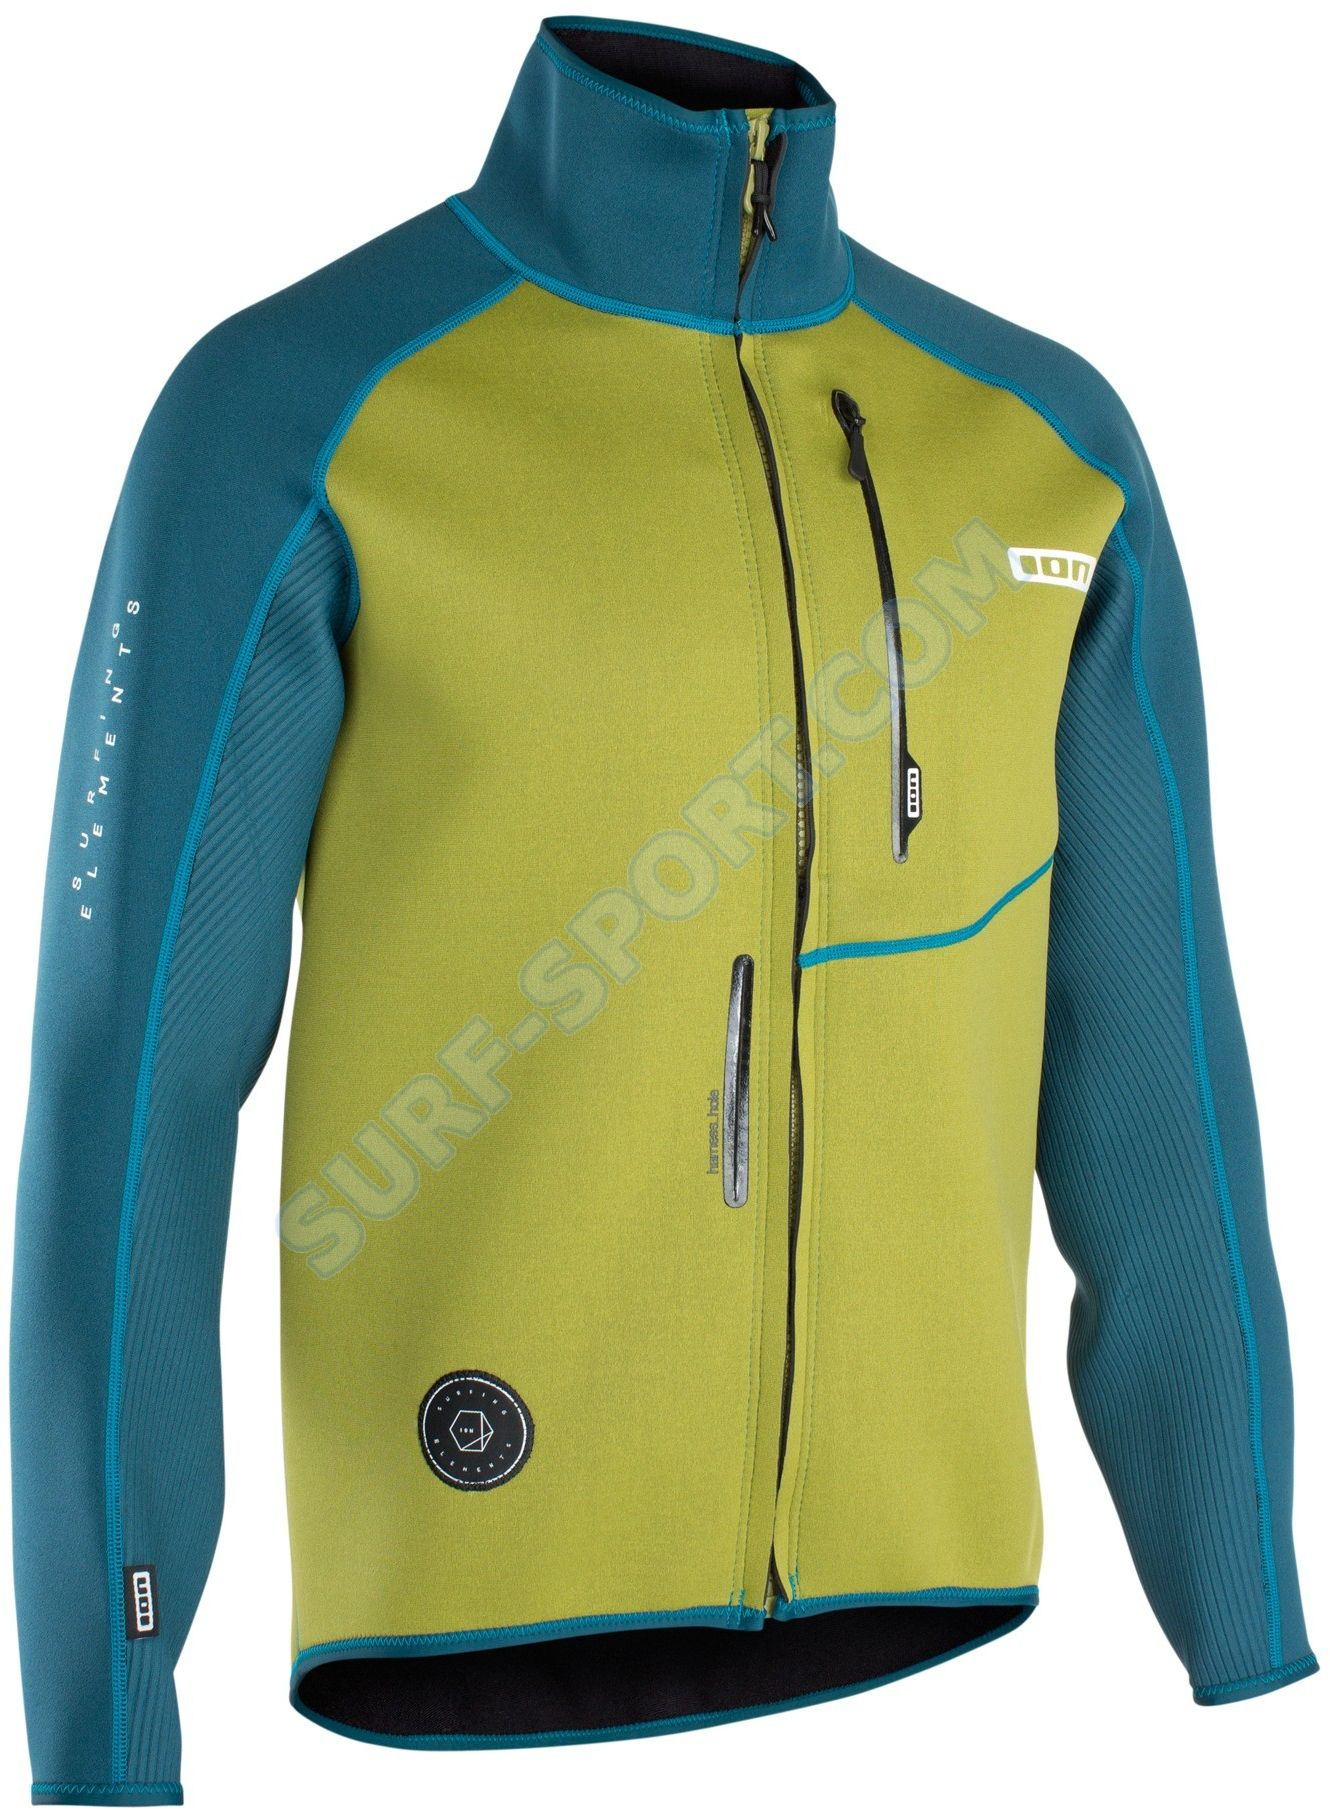 Kurtka Neoprenowa ION Neo Cruise Jacket 2019 Marine / Olive Green